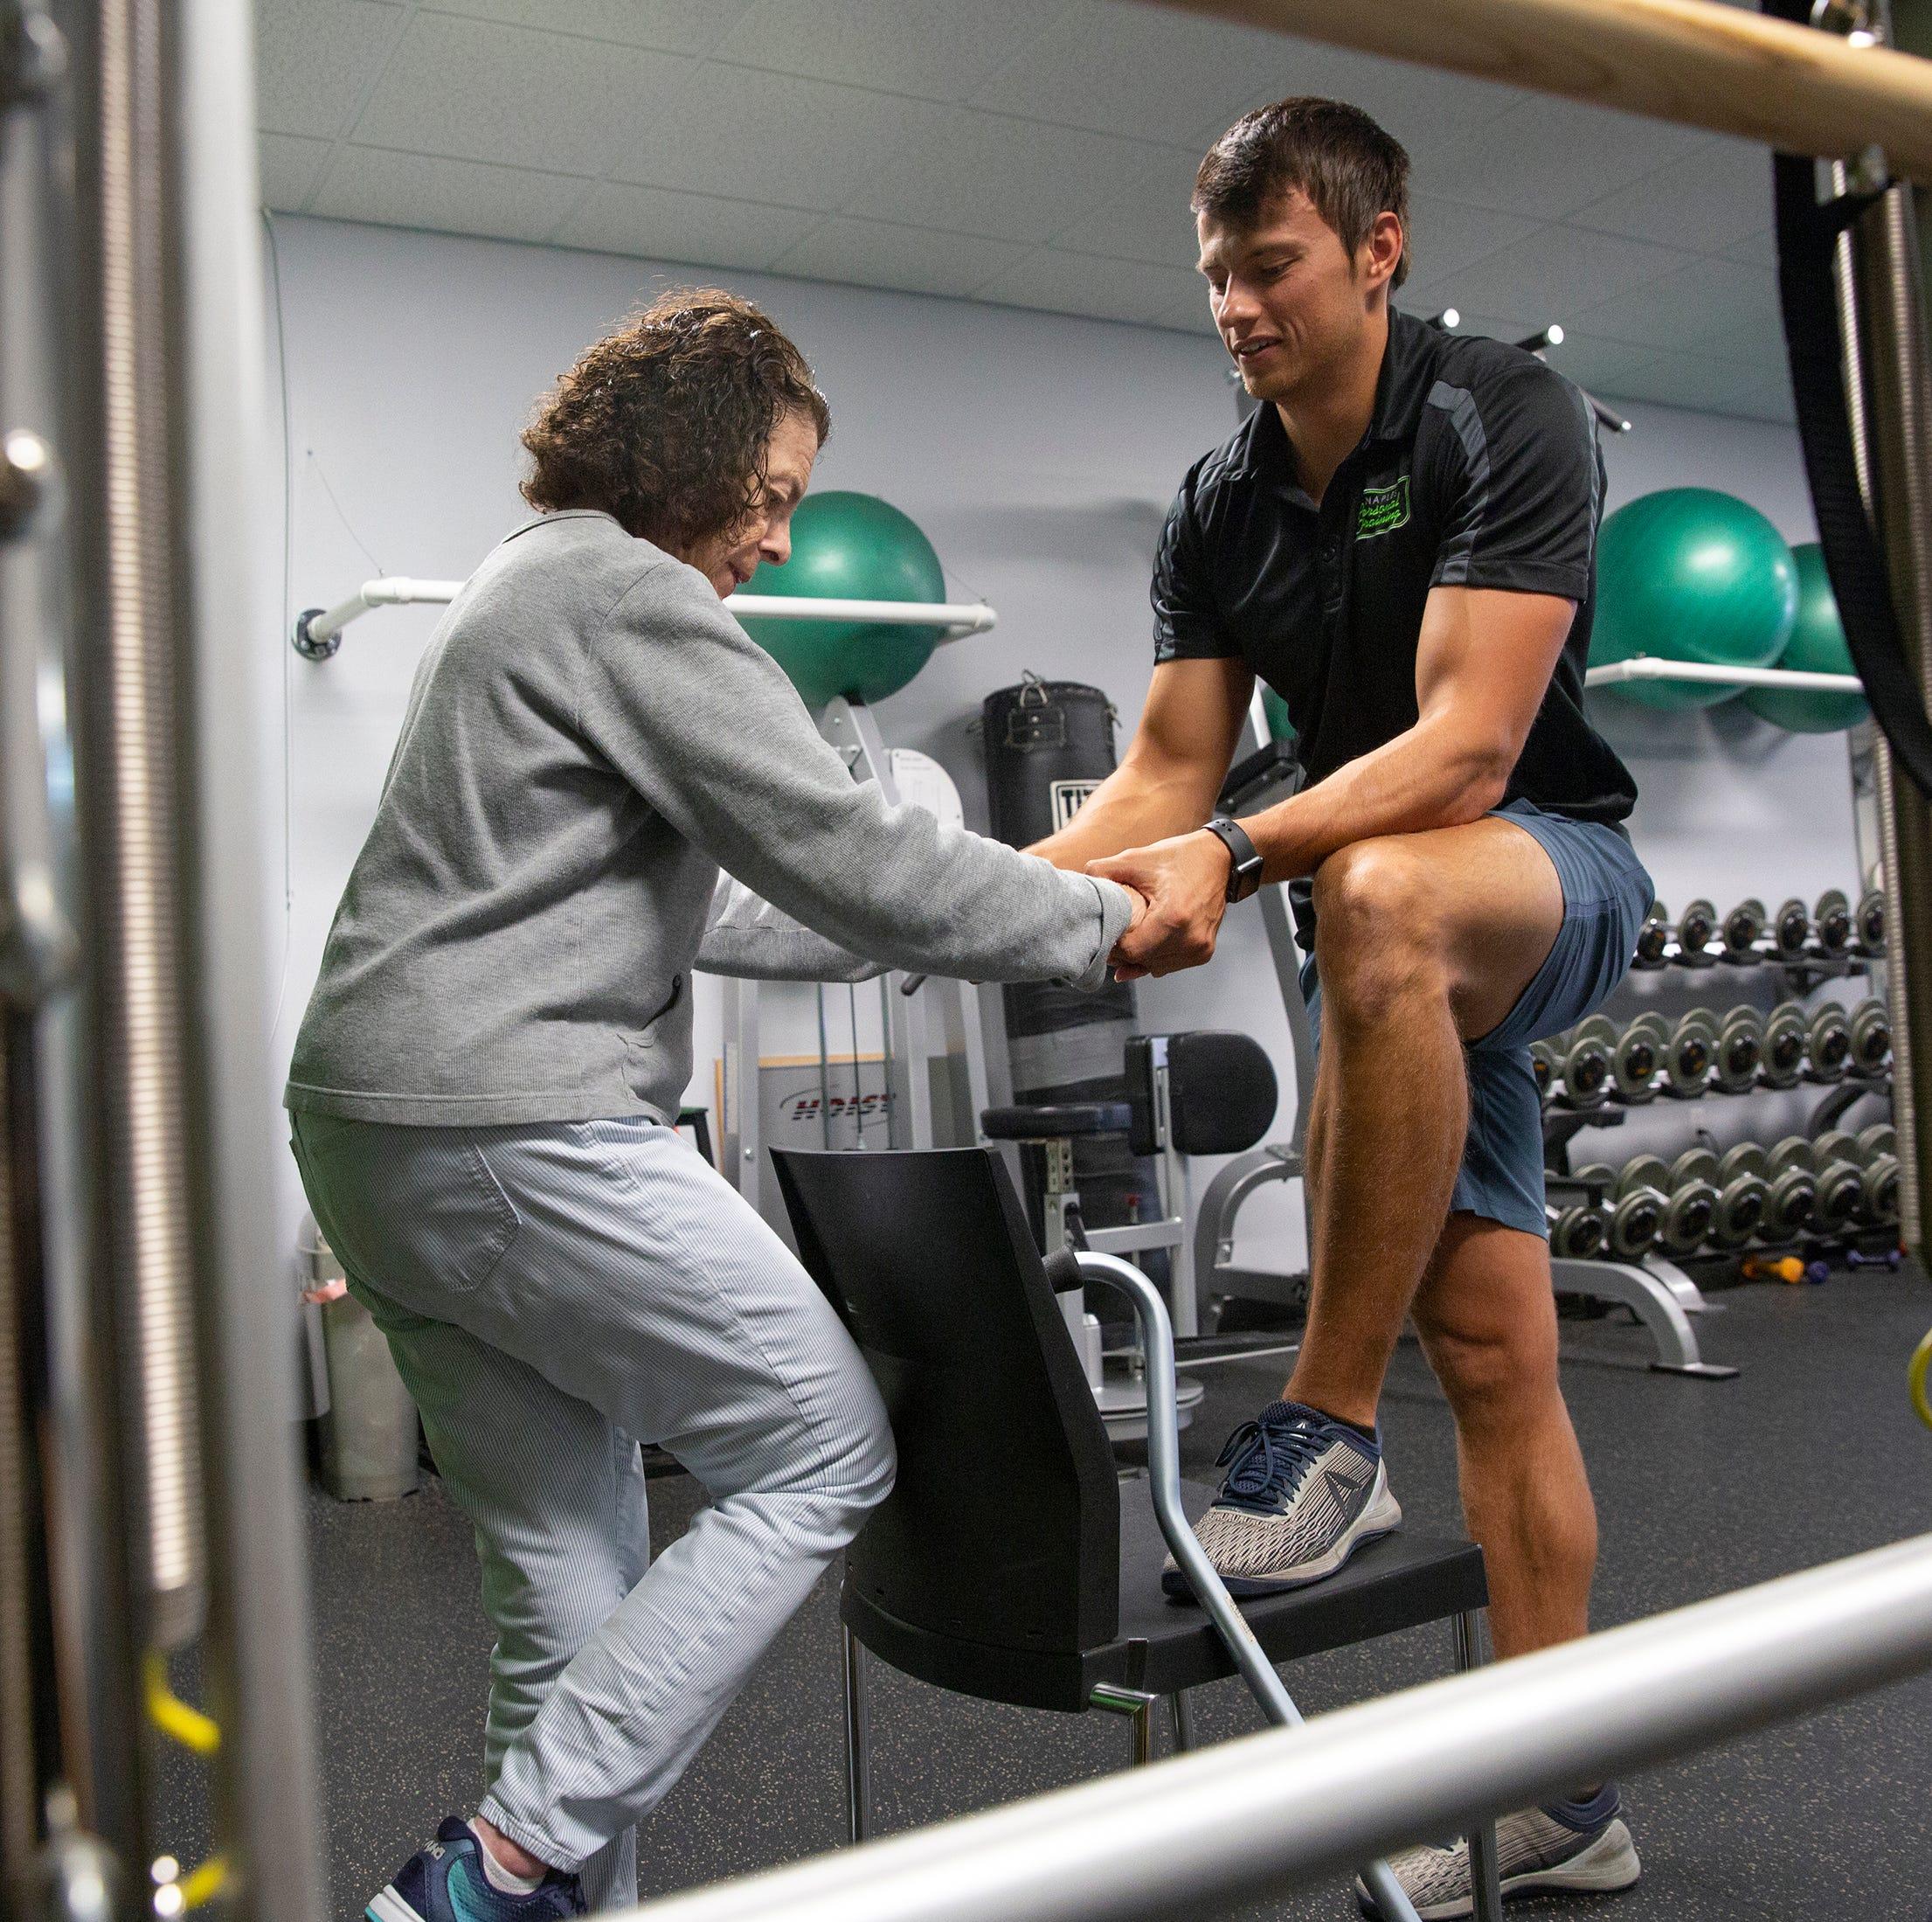 Naples gym kicks off its Power Over Parkinson's fitness class